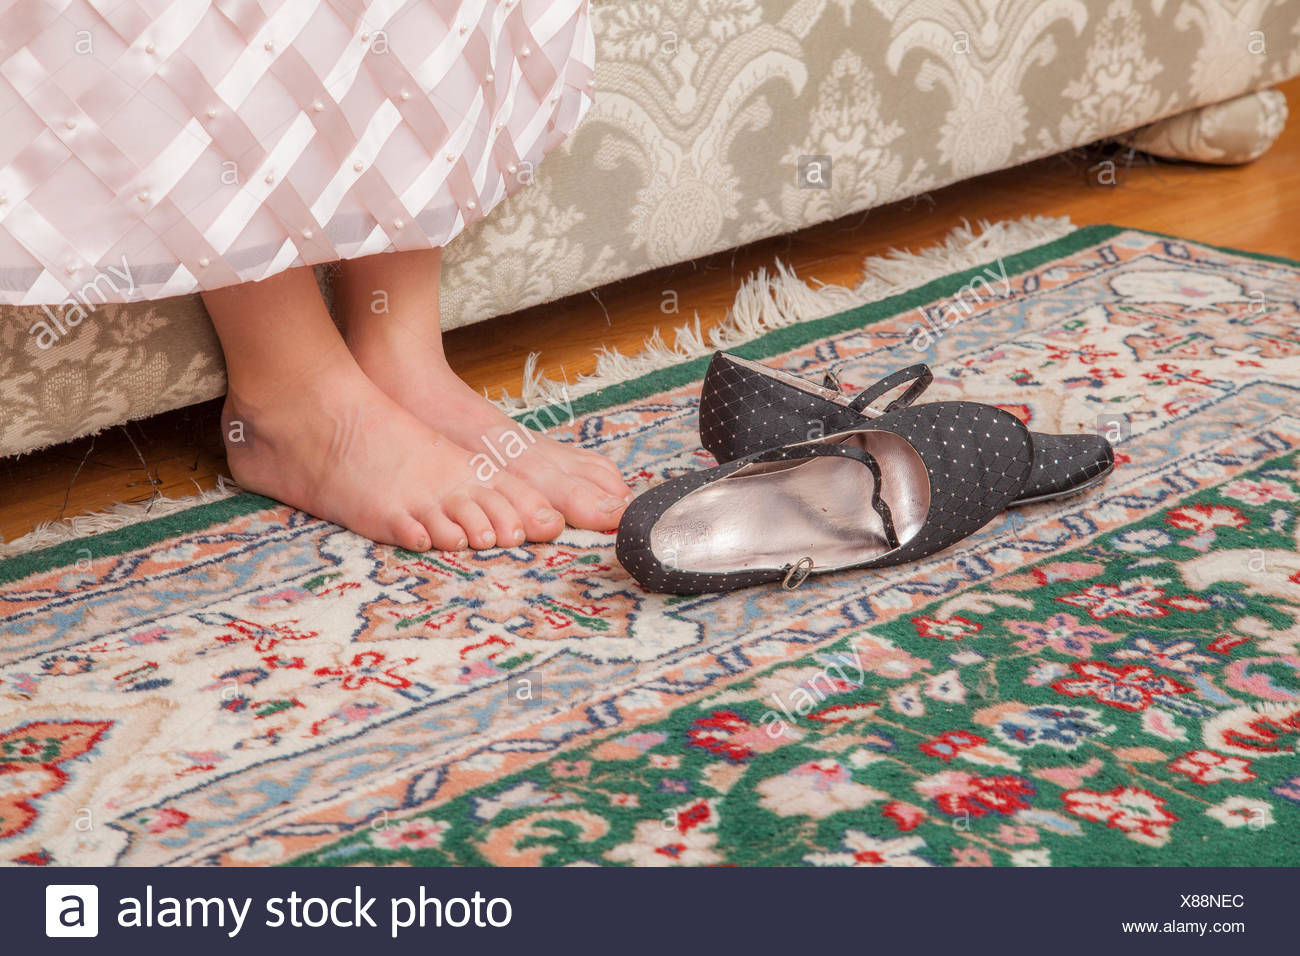 Young girl's bare feet. - Stock Image